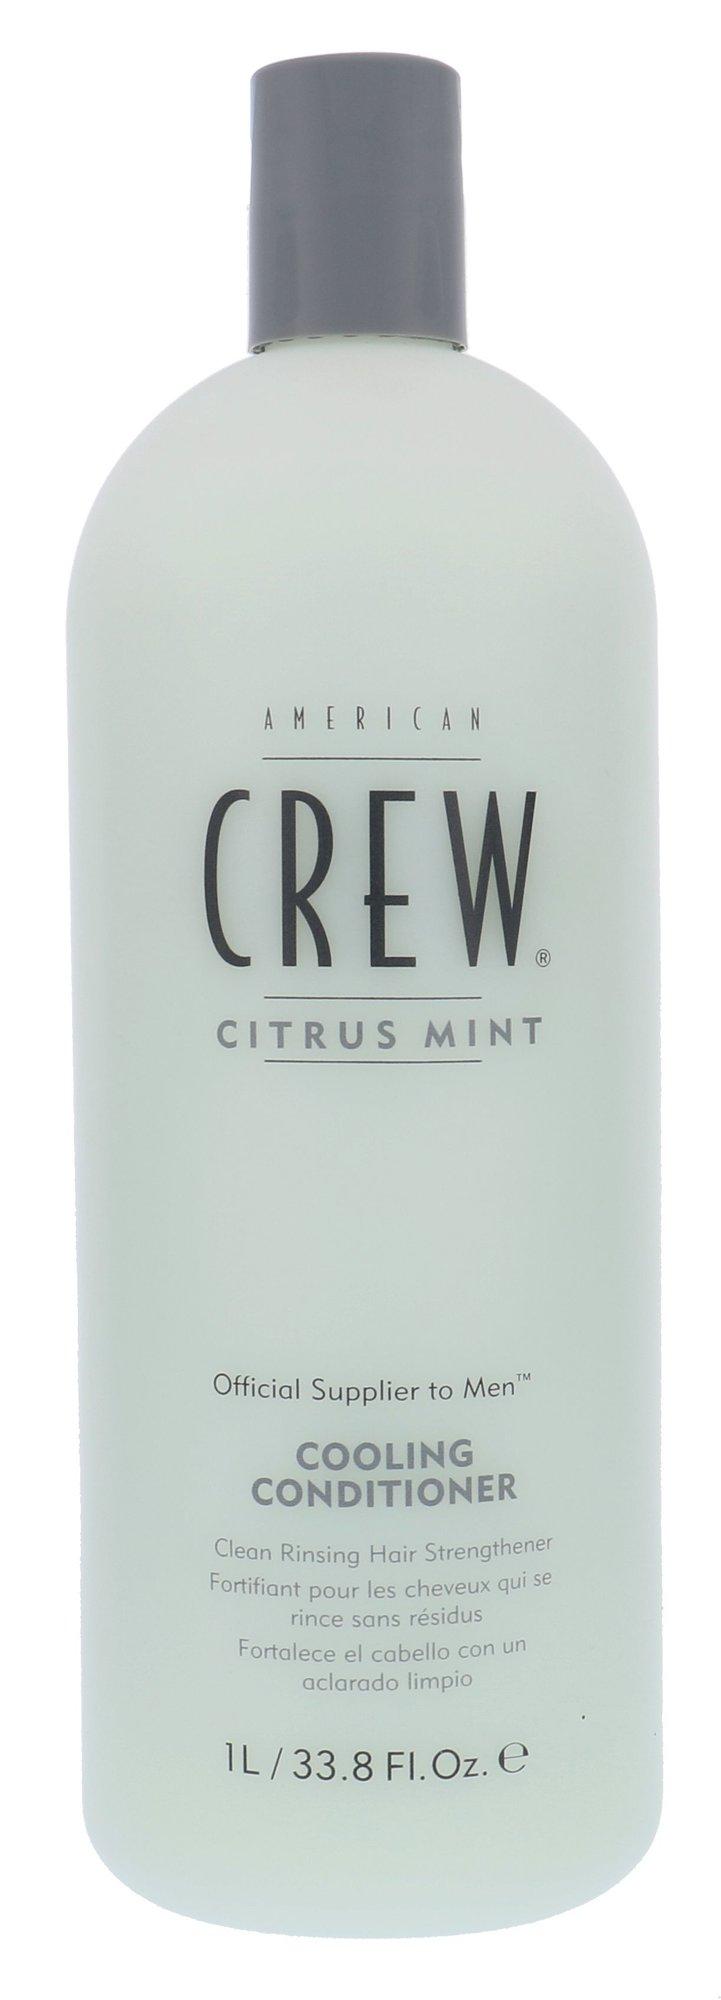 American Crew Citrus Mint Cosmetic 1000ml